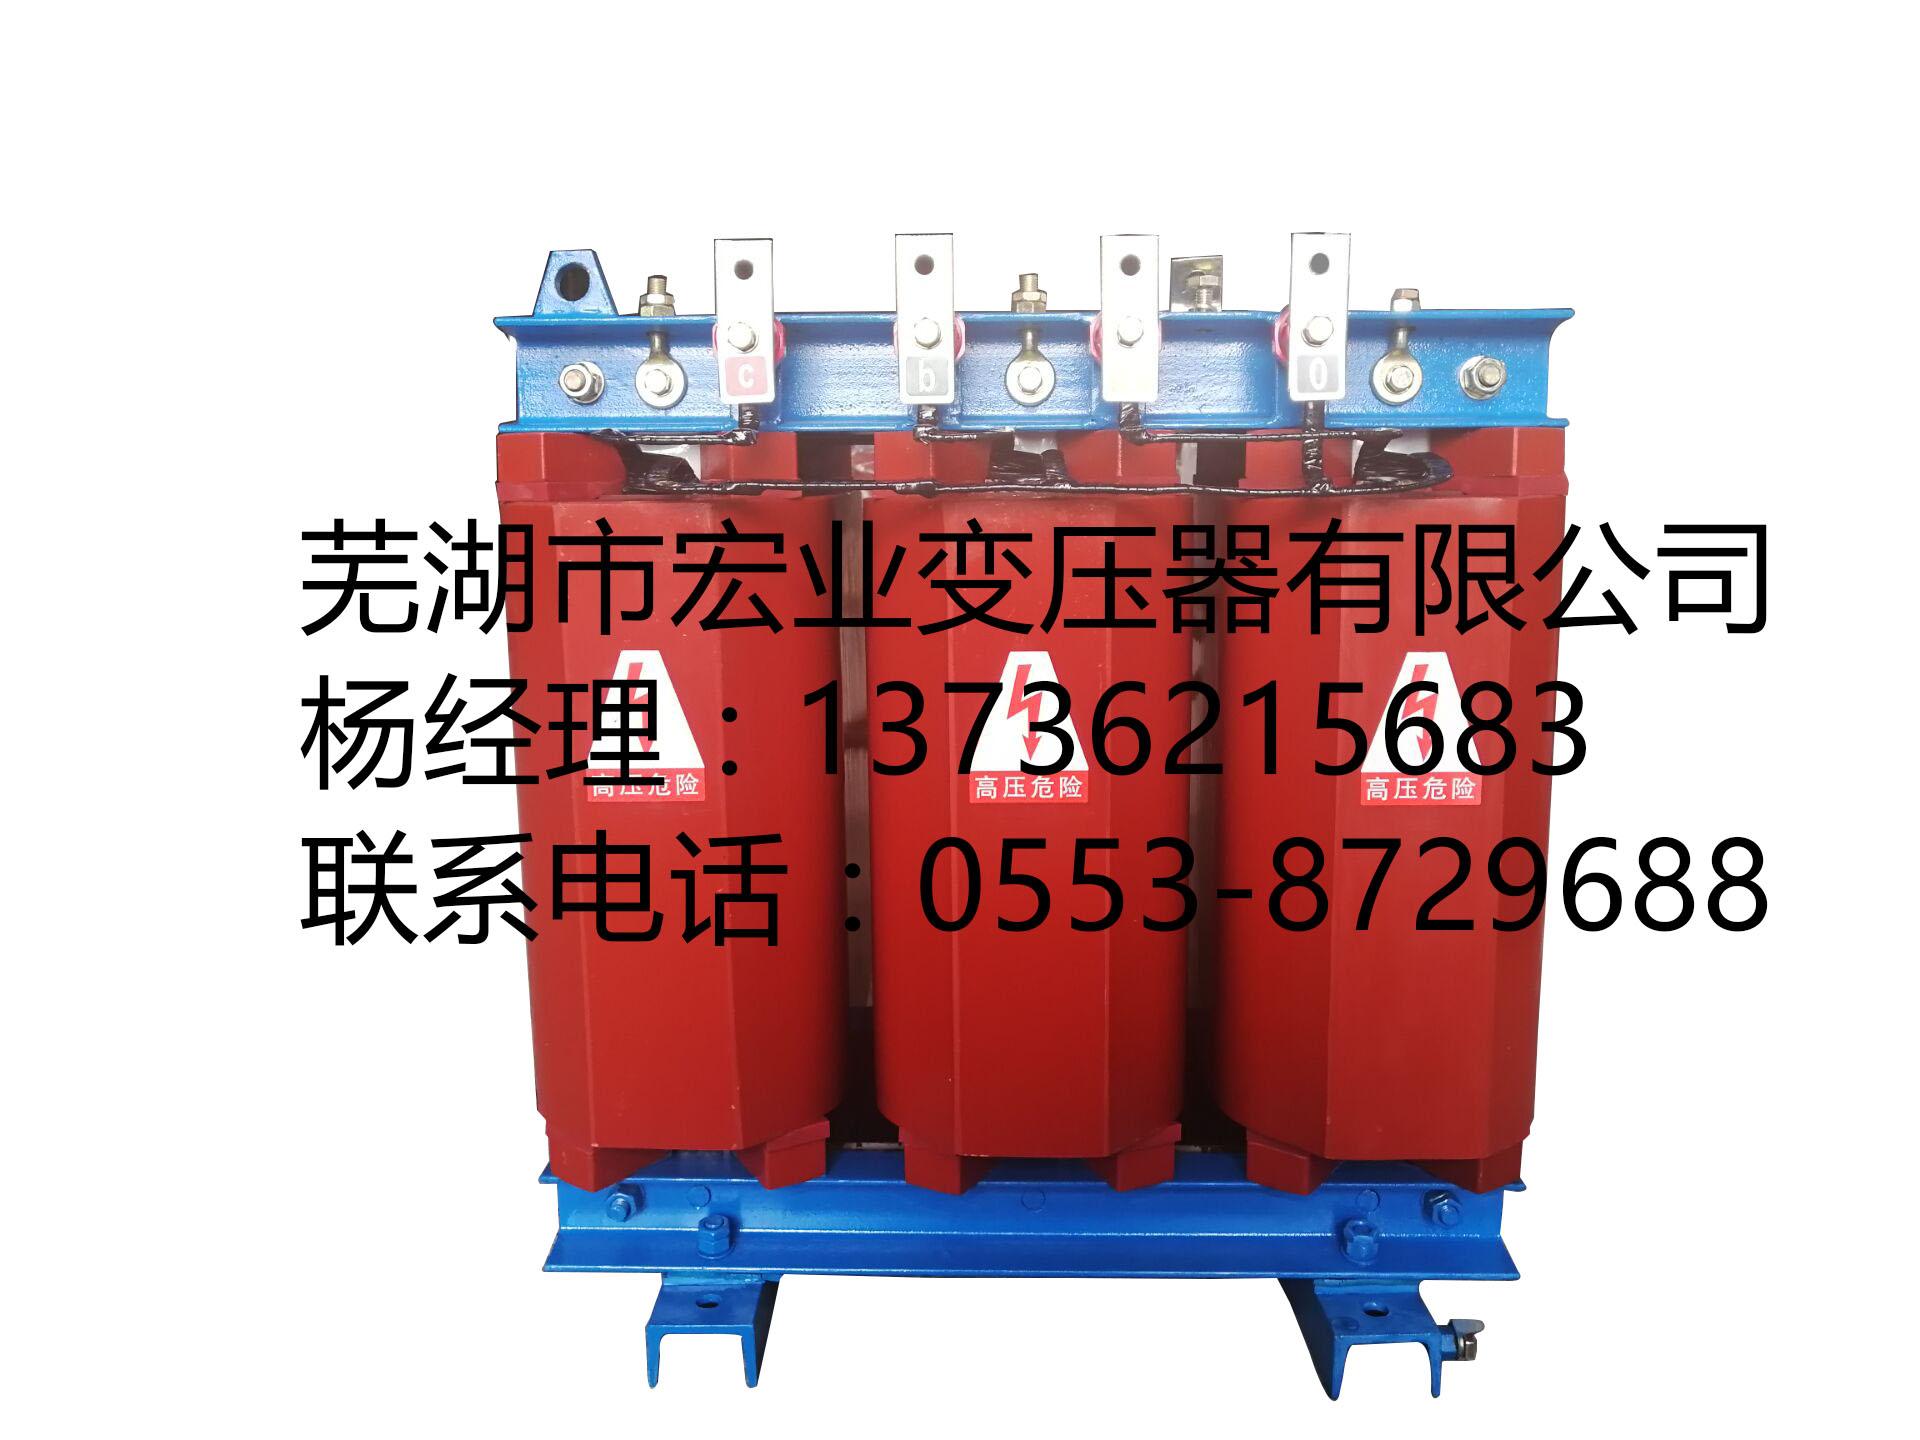 SC11-30/10-0.4干式站用变压器所用变压器厂家价格